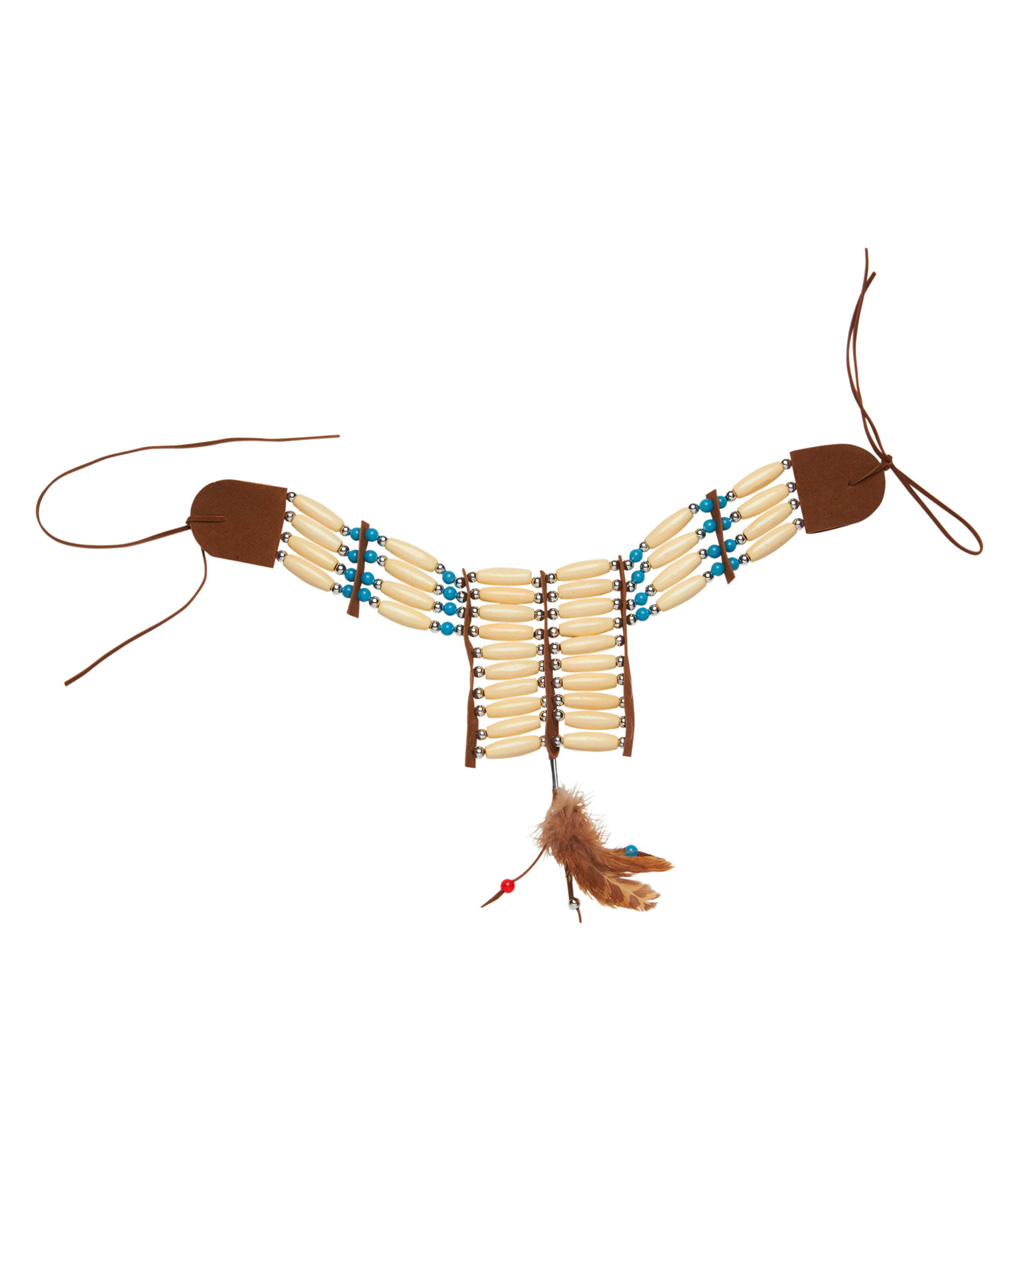 indianer halsband indianer schmuck g nstig kaufen. Black Bedroom Furniture Sets. Home Design Ideas